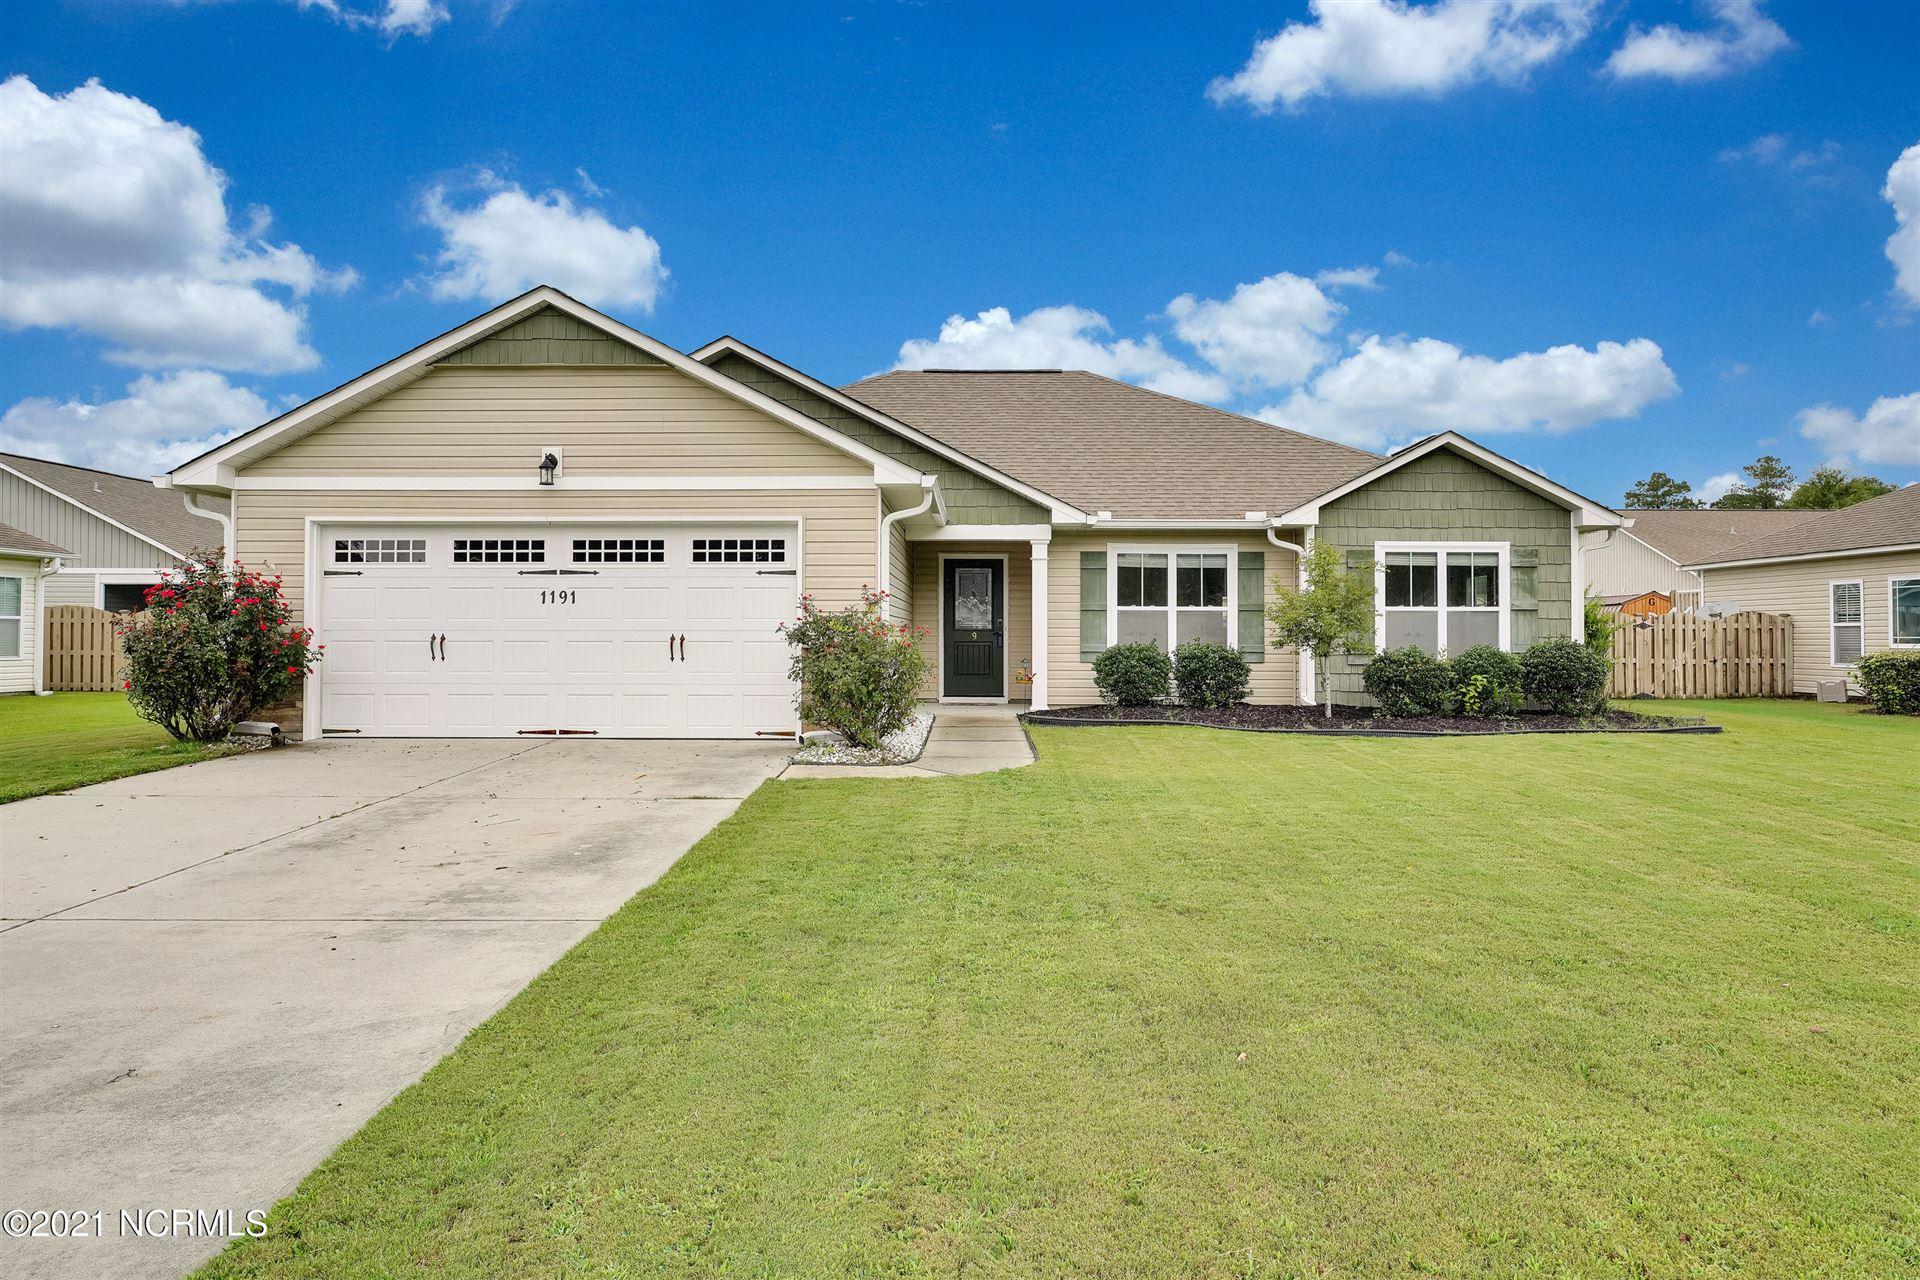 Photo for 1191 Clancy Drive NE, Leland, NC 28451 (MLS # 100284460)